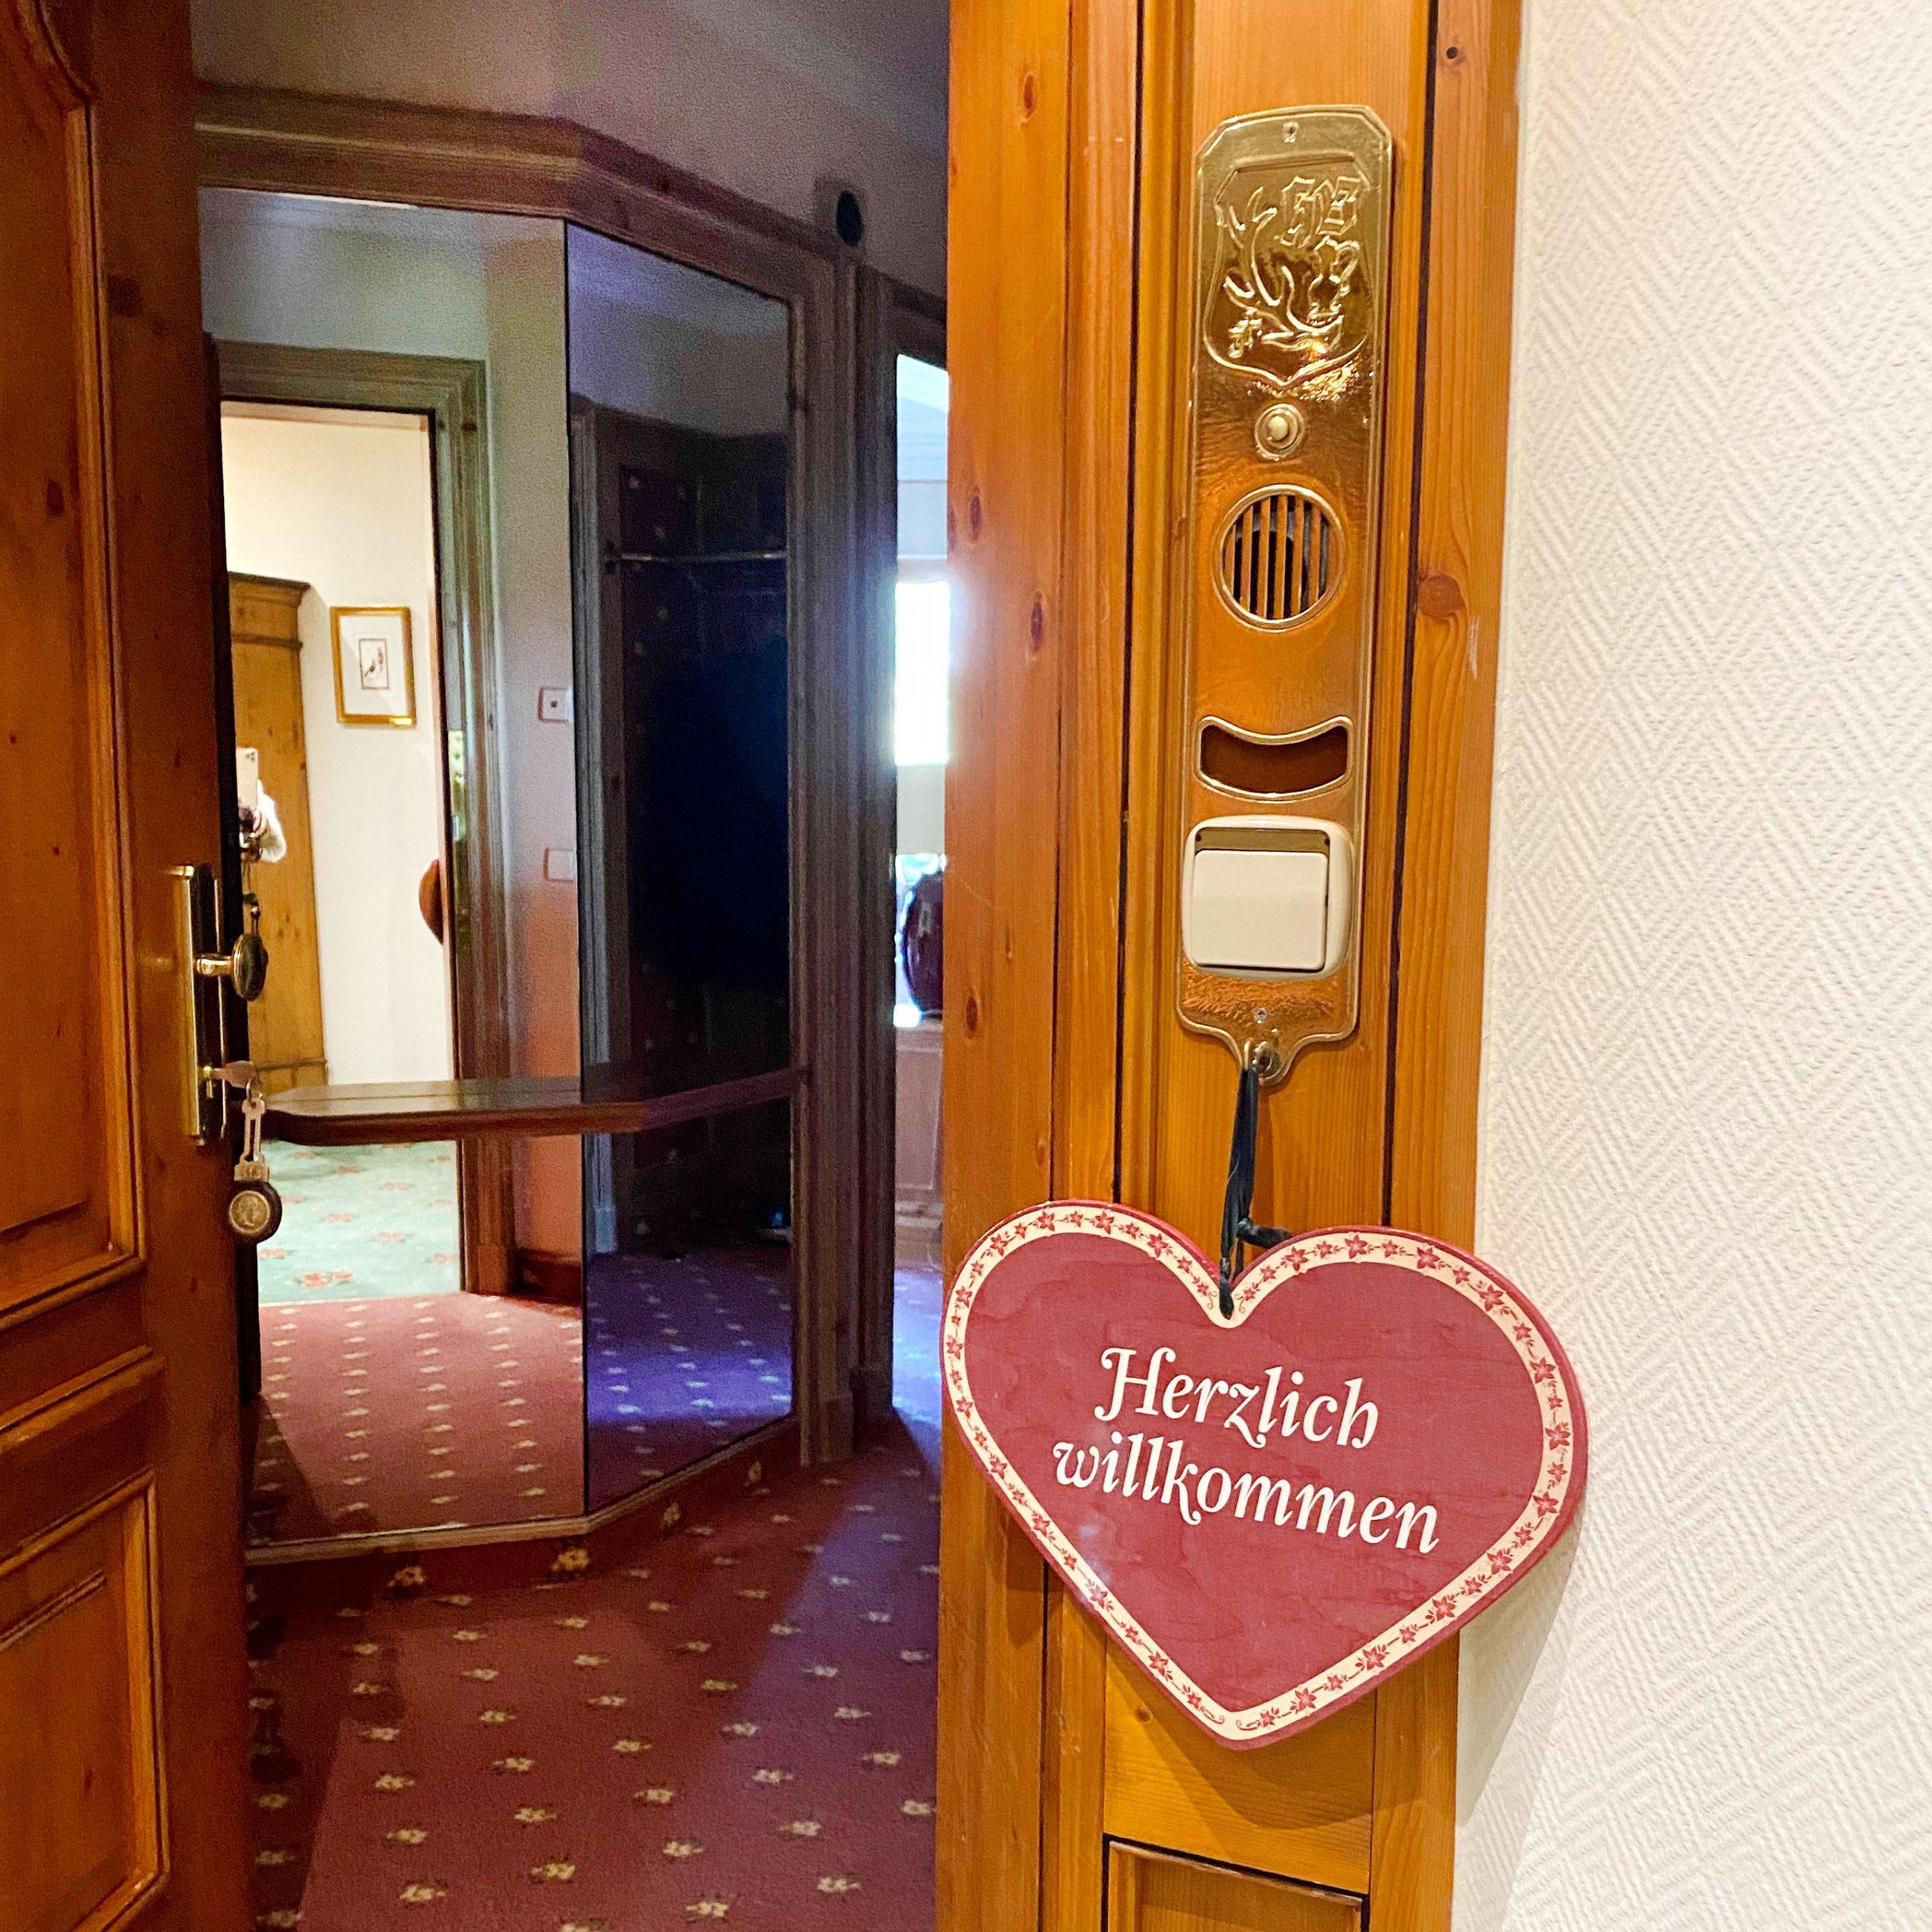 Urlaub im Hotel trotz Corona-Pandemie. Willkommen im Hotel Bareiss